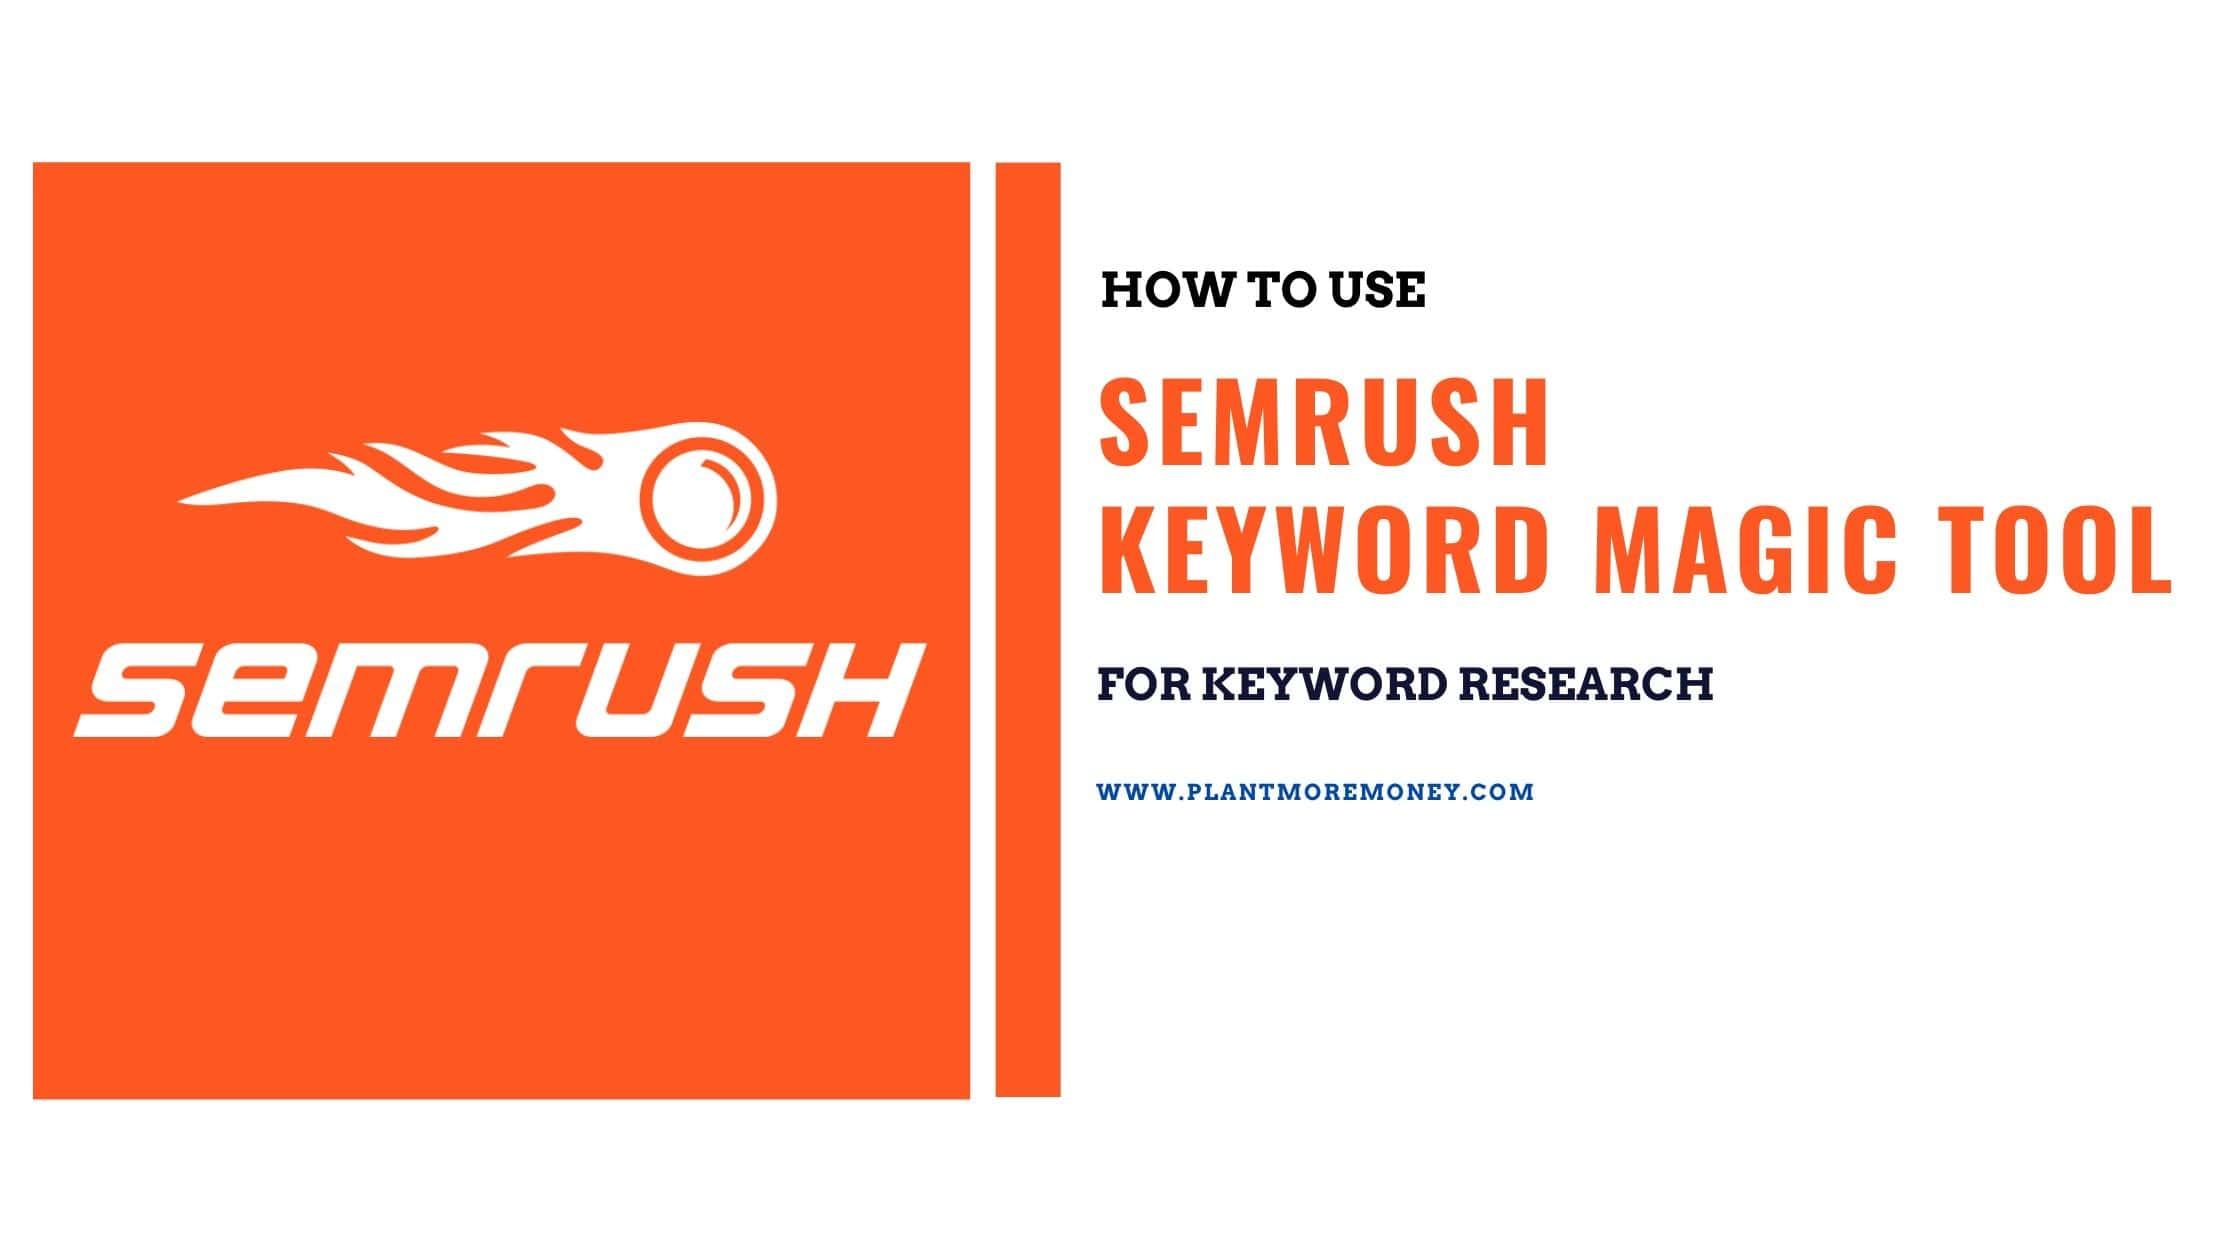 How To Use SEMrush Keyword Magic Tool For Keyword Research?